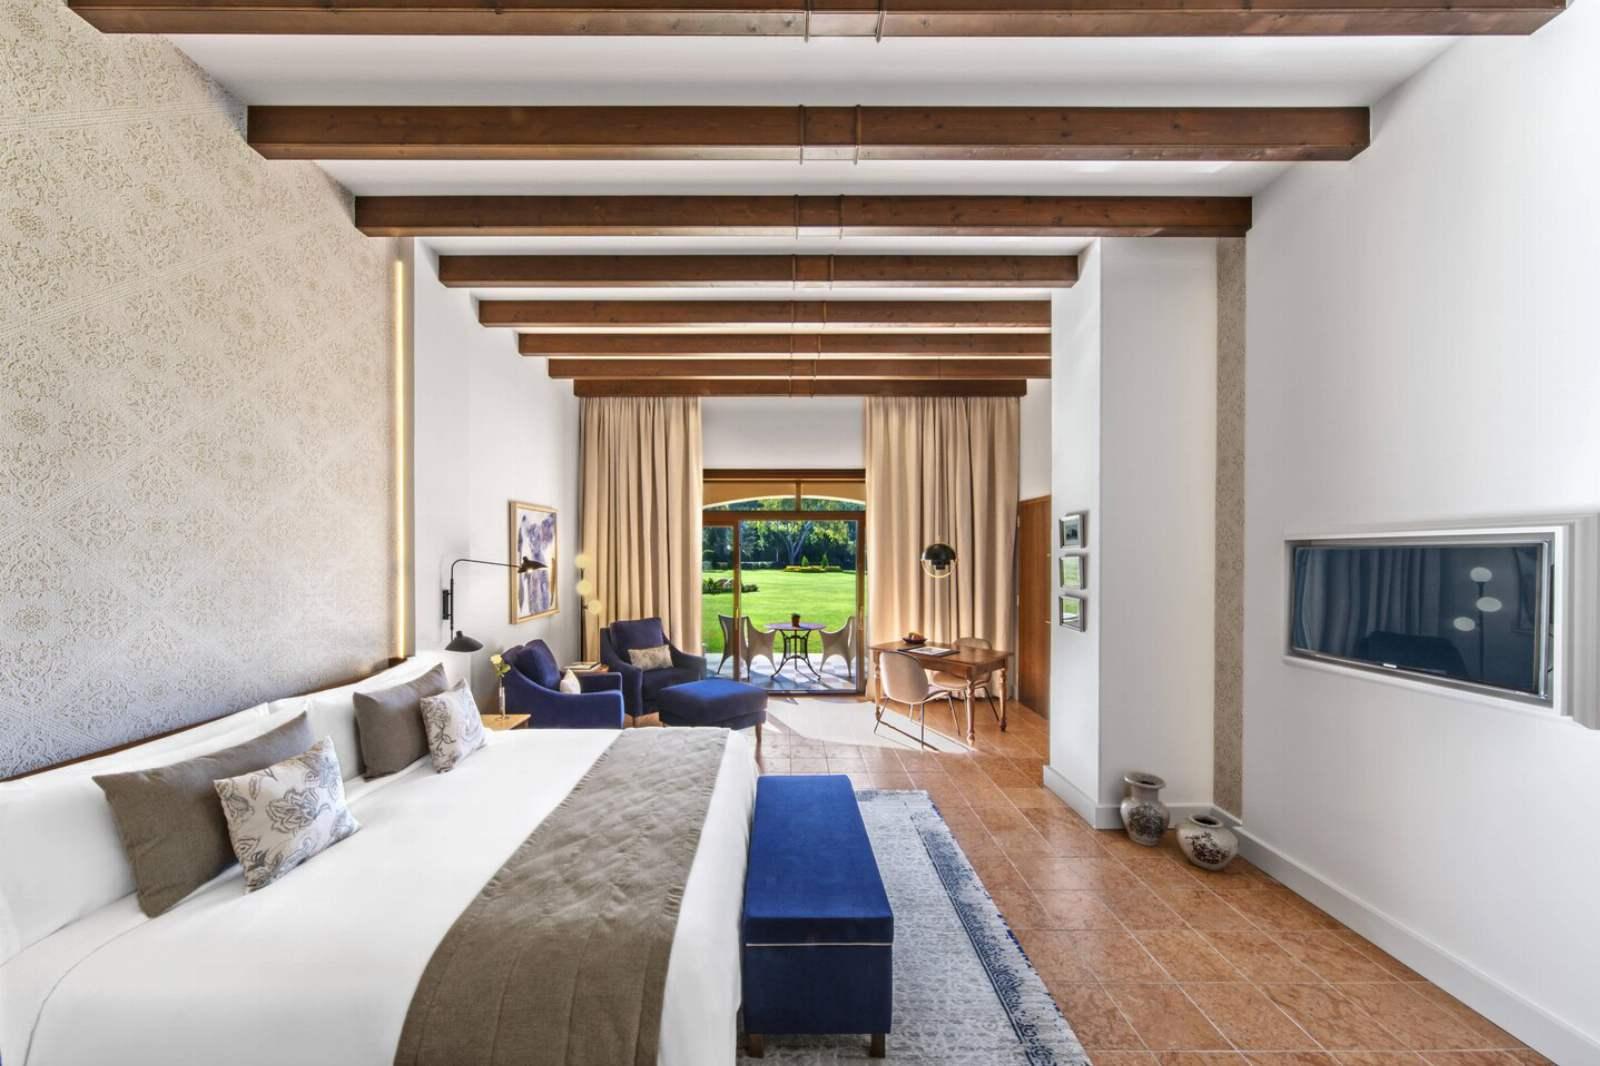 St. Regis Mardavall Resort - Junior Suite, Garden Access